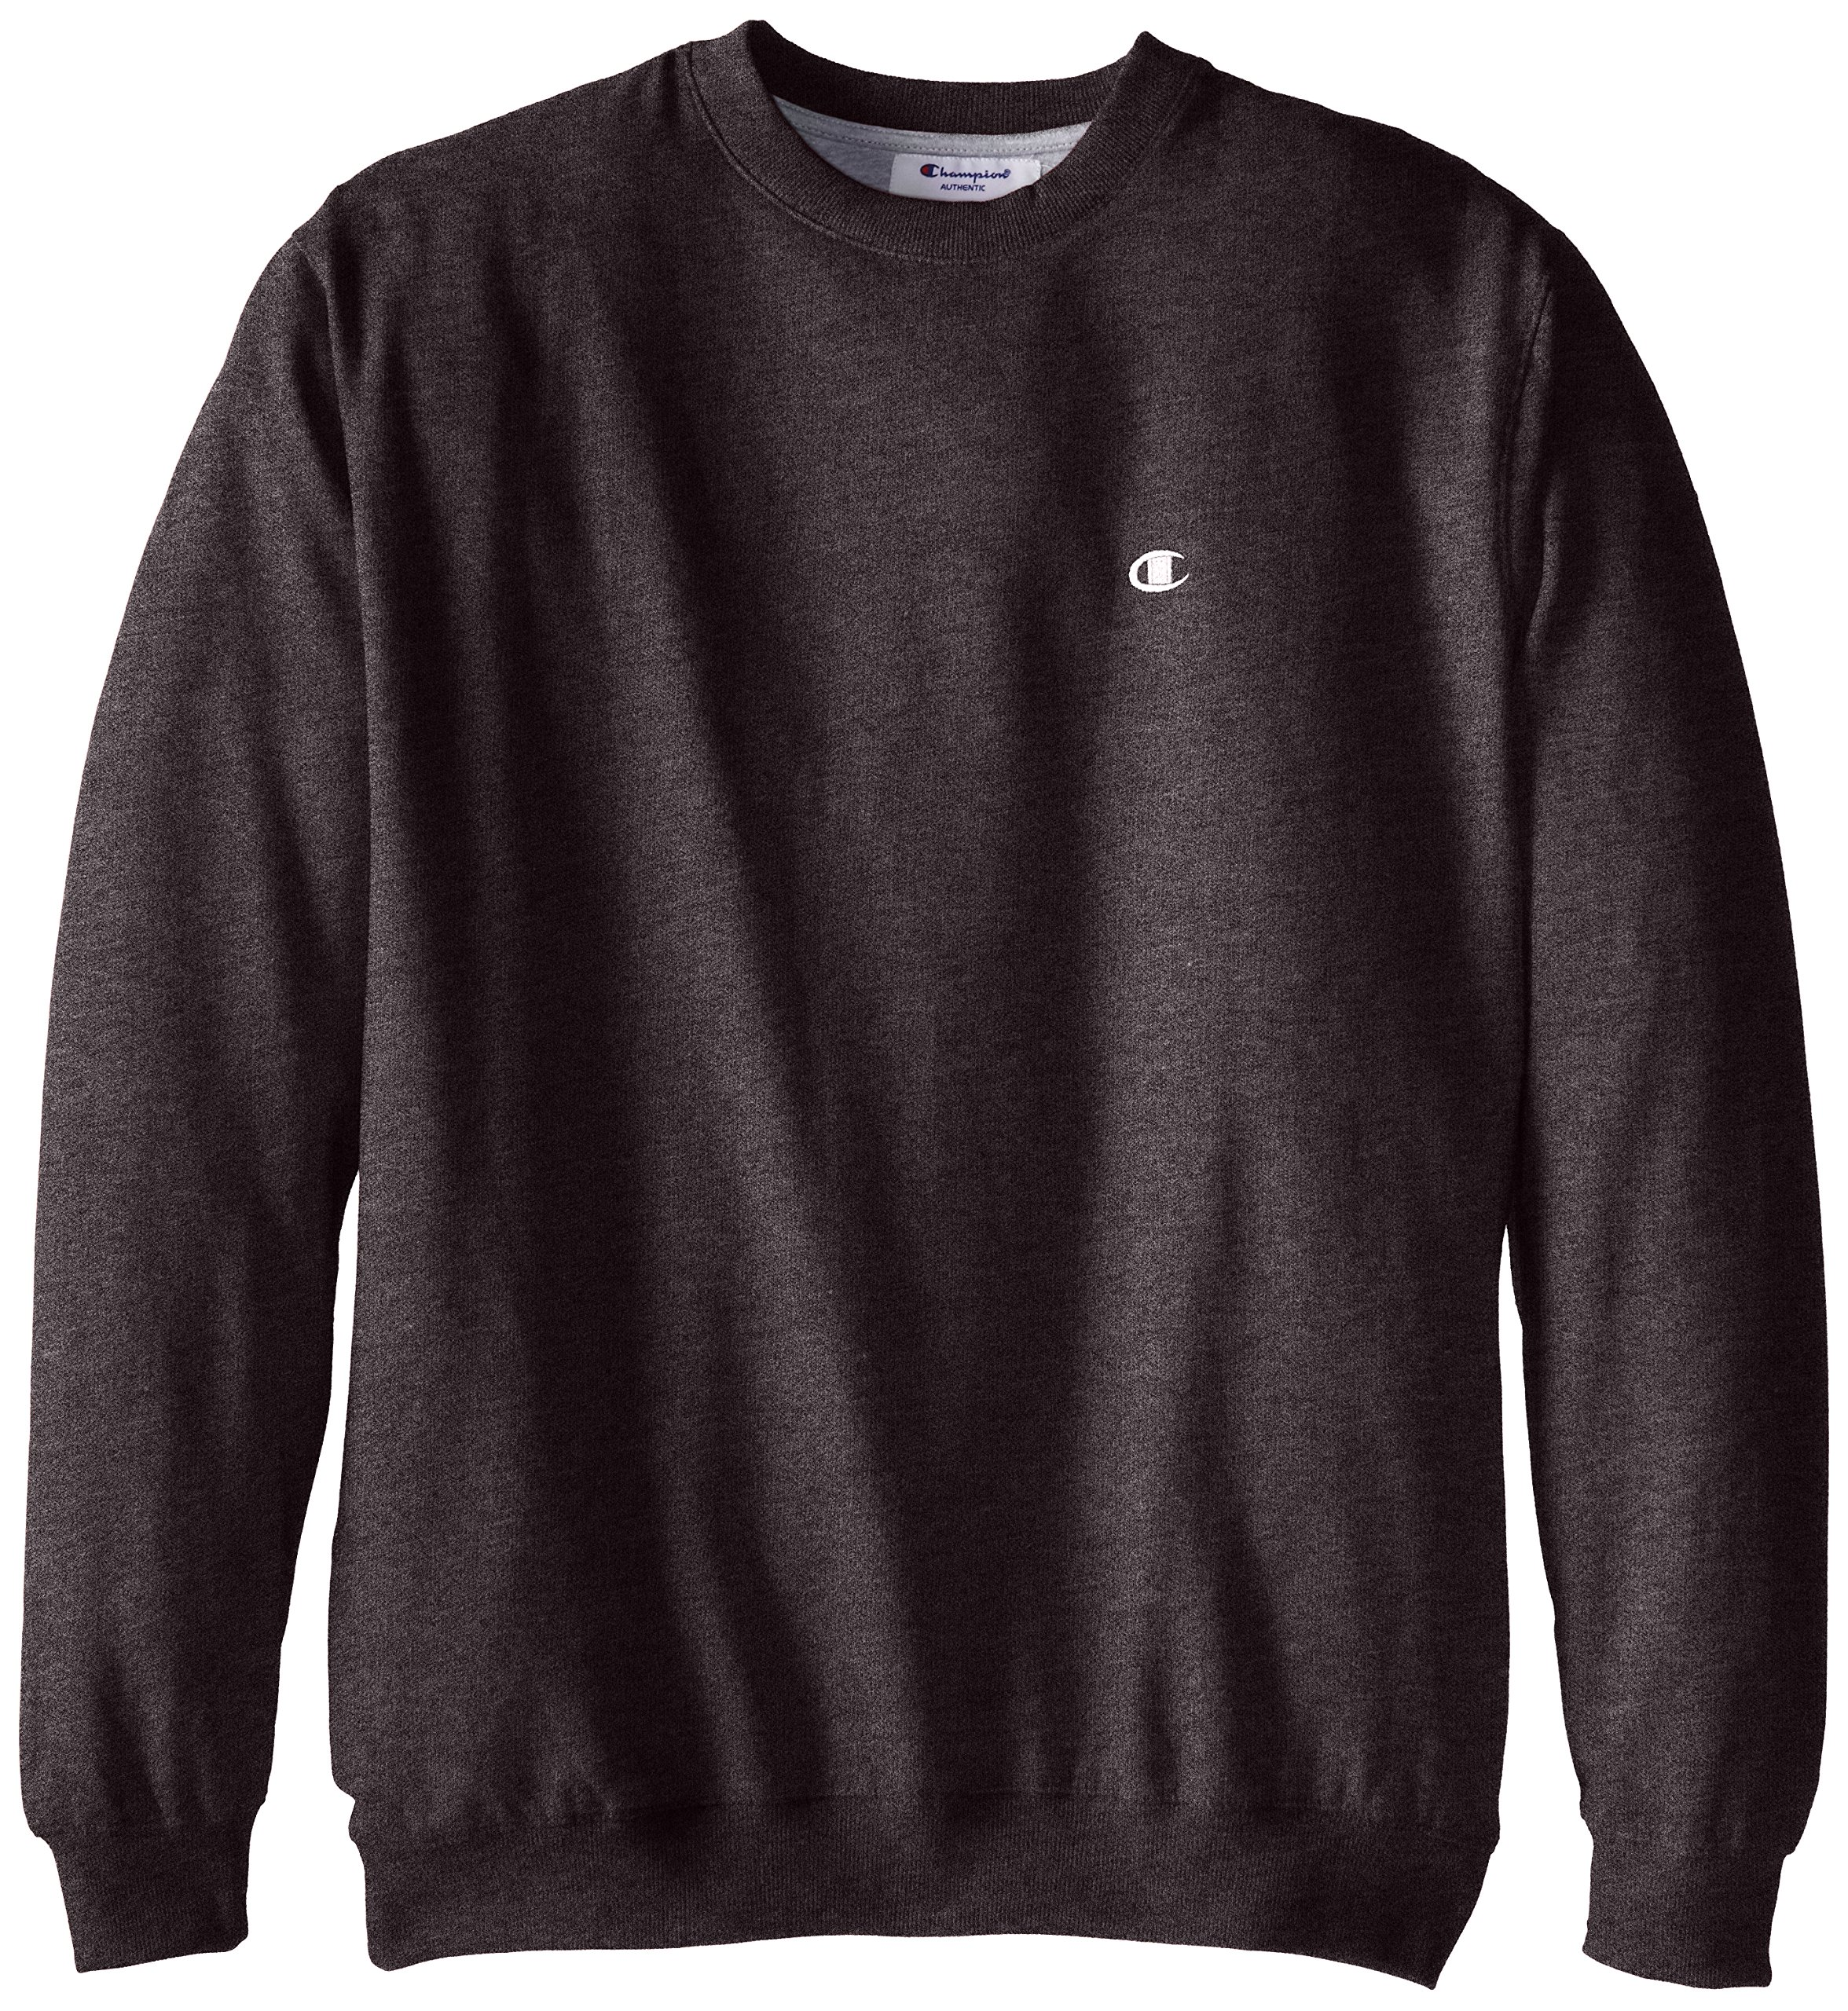 Champion Men's Big-Tall Fleece Crew Sweatshirt, Charcoal Heather, 5X